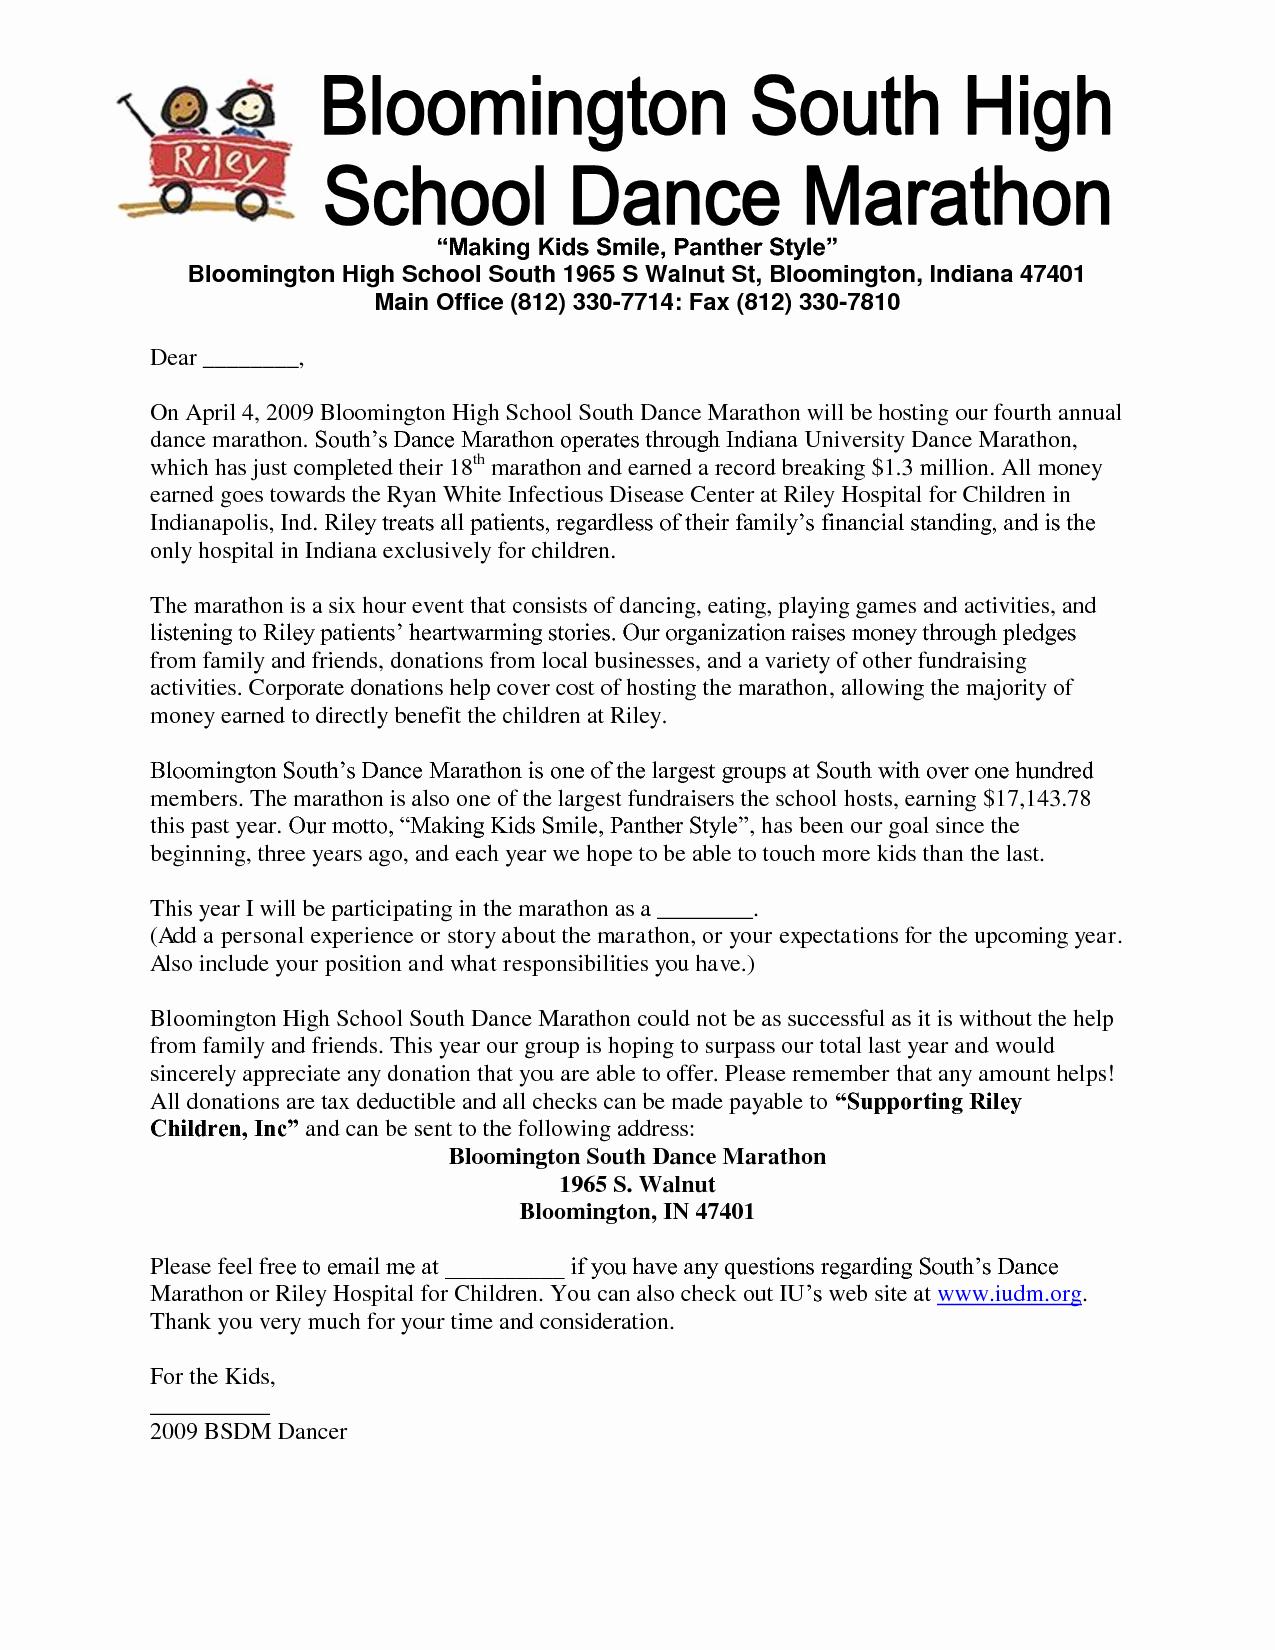 Mission Trip Donation Letter Template Elegant Best S Of Fundraising Letter Template Fundraising